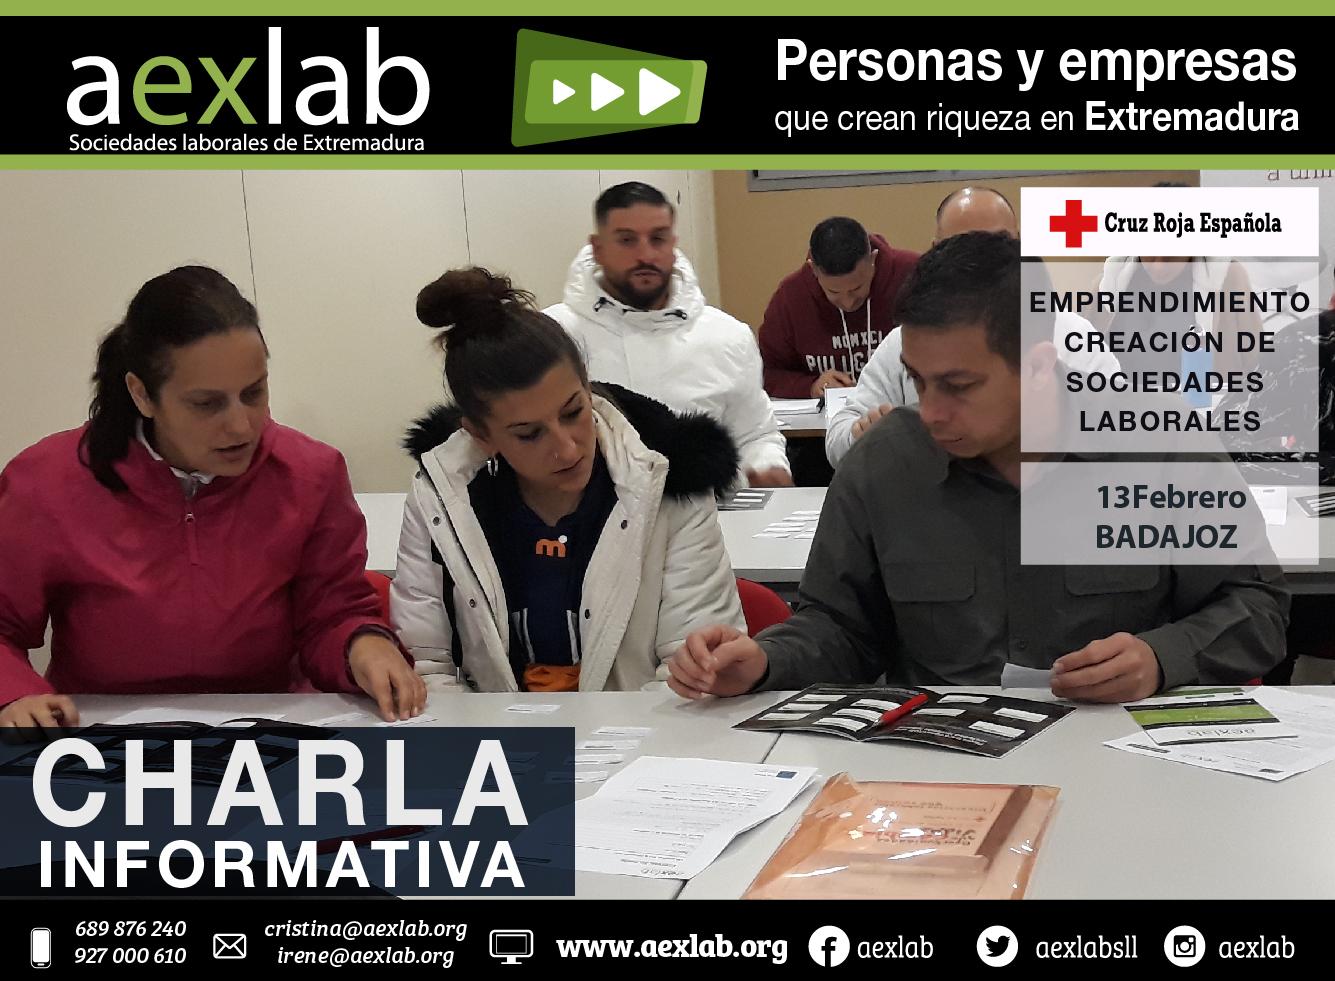 Asistentes charla CRUZ ROJA 13 febrero aexlab 5